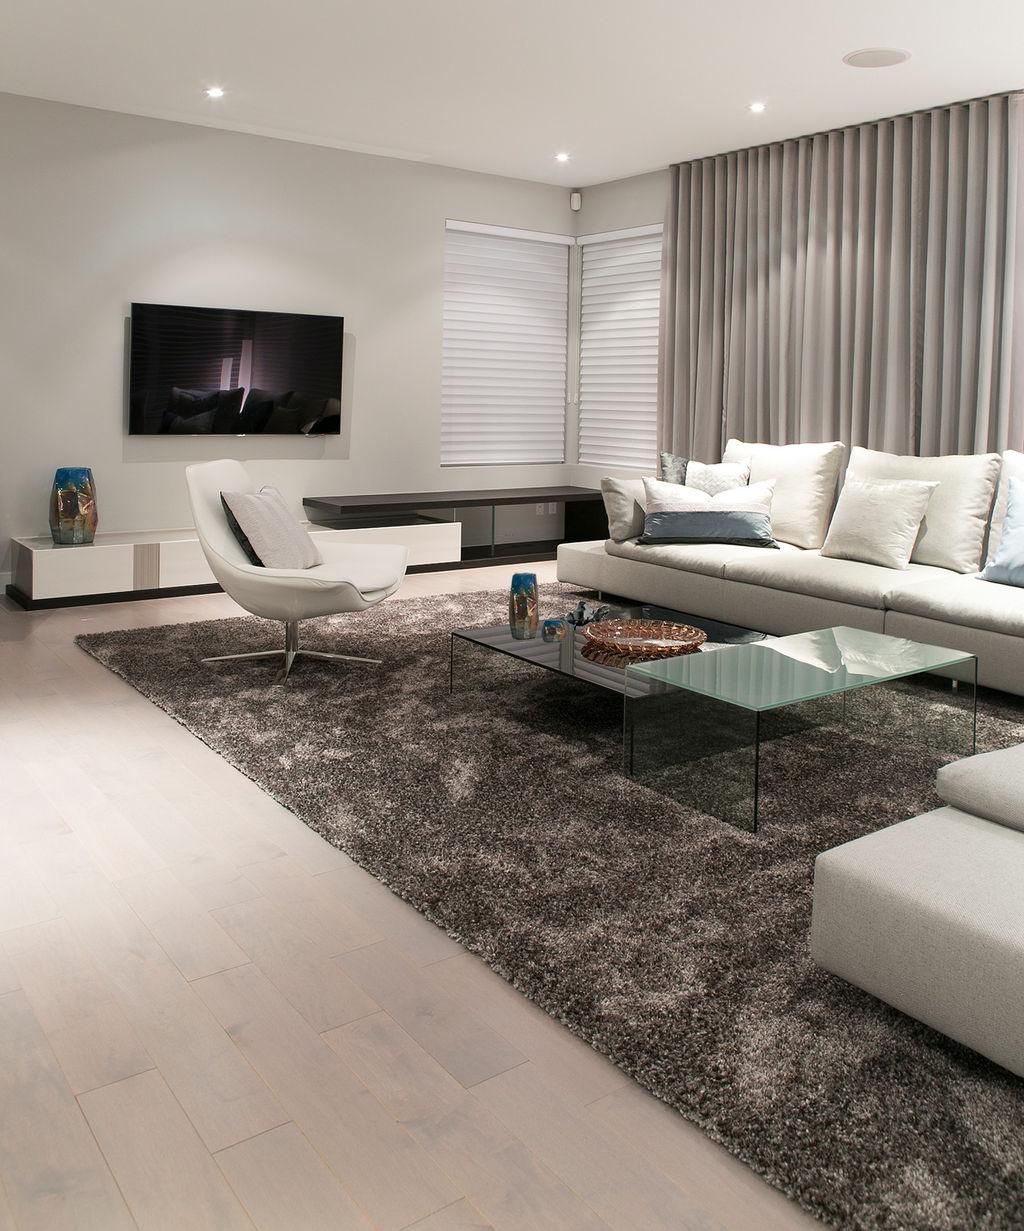 Raimondi Design - Inernational Interior Design - Rénovation ...